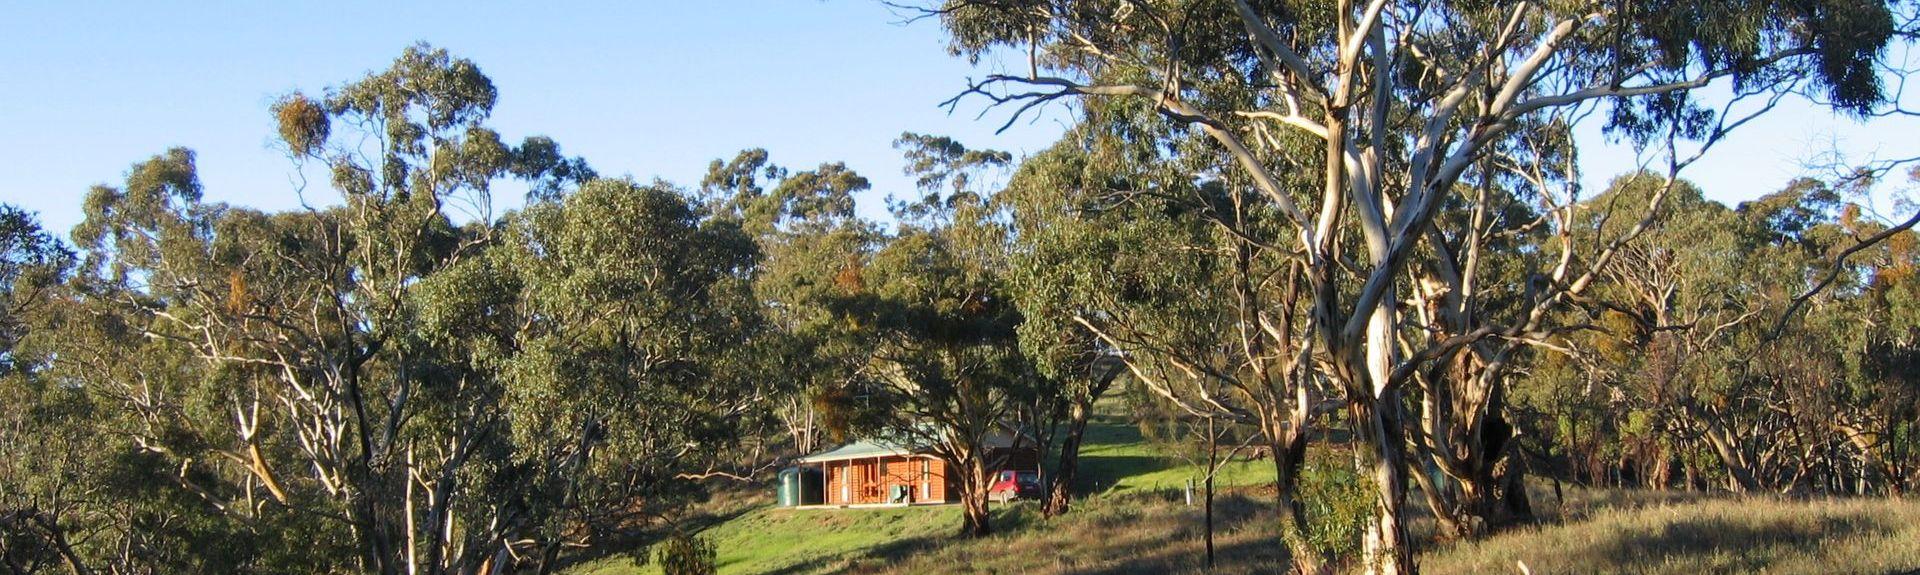 Auburn, SA holiday accommodation: Houses & more | HomeAway